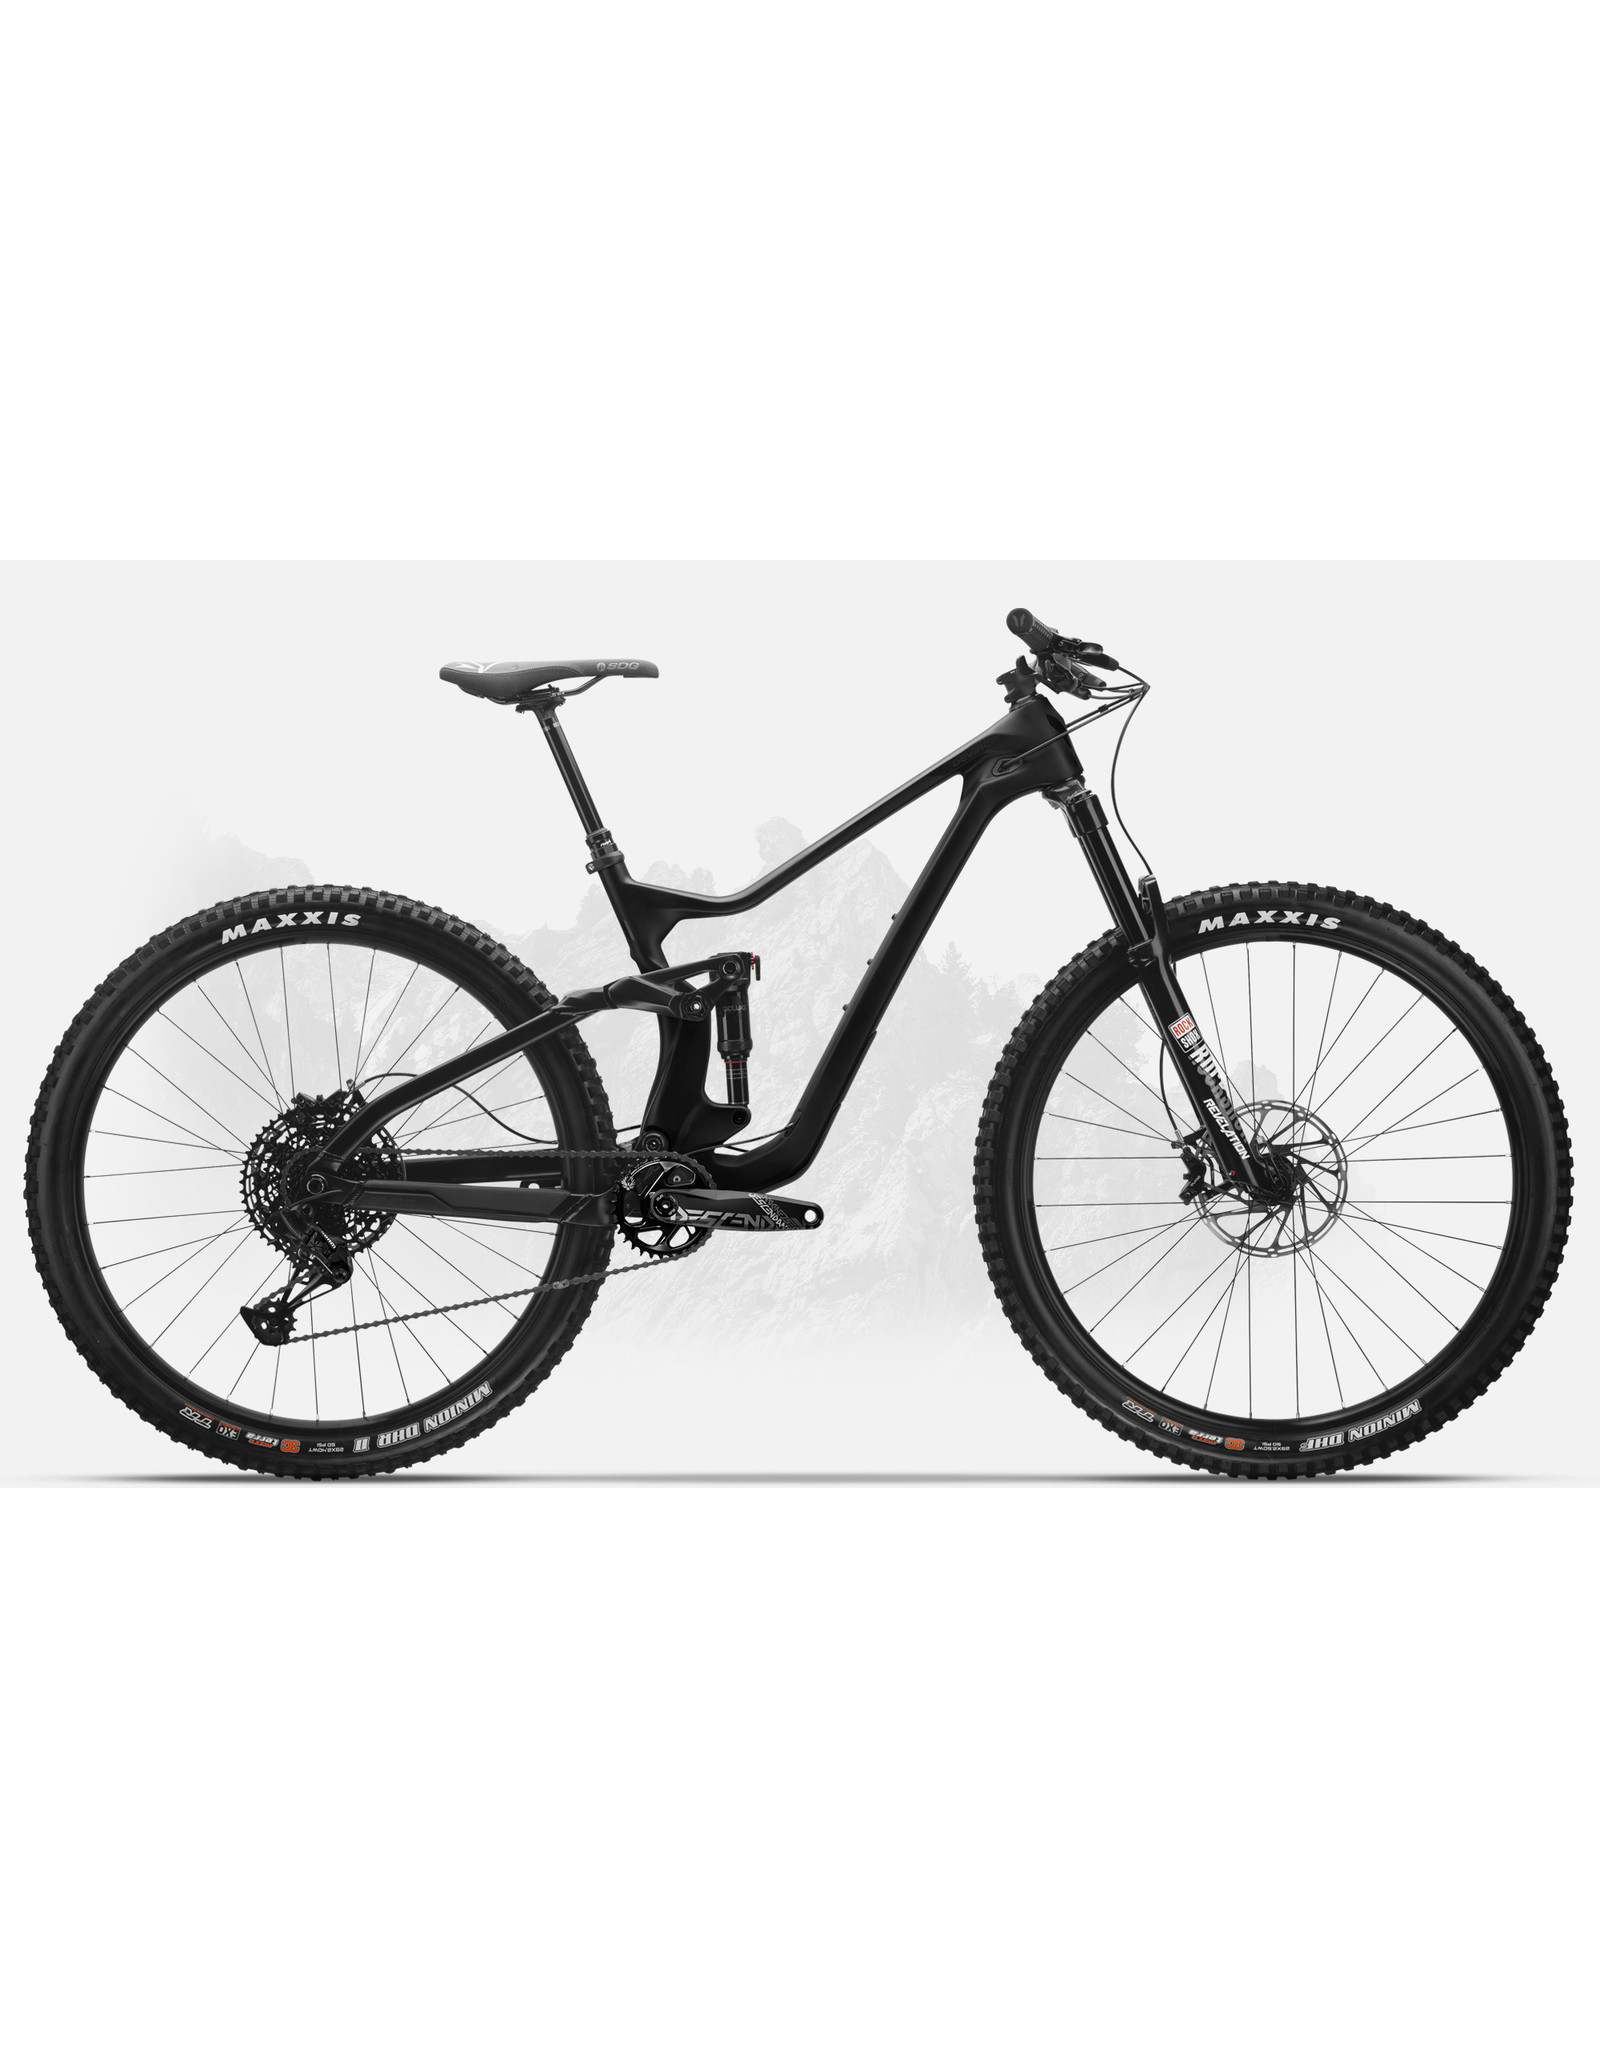 DEVINCI 2020 Troy 29 Carbon NX/GX black XL